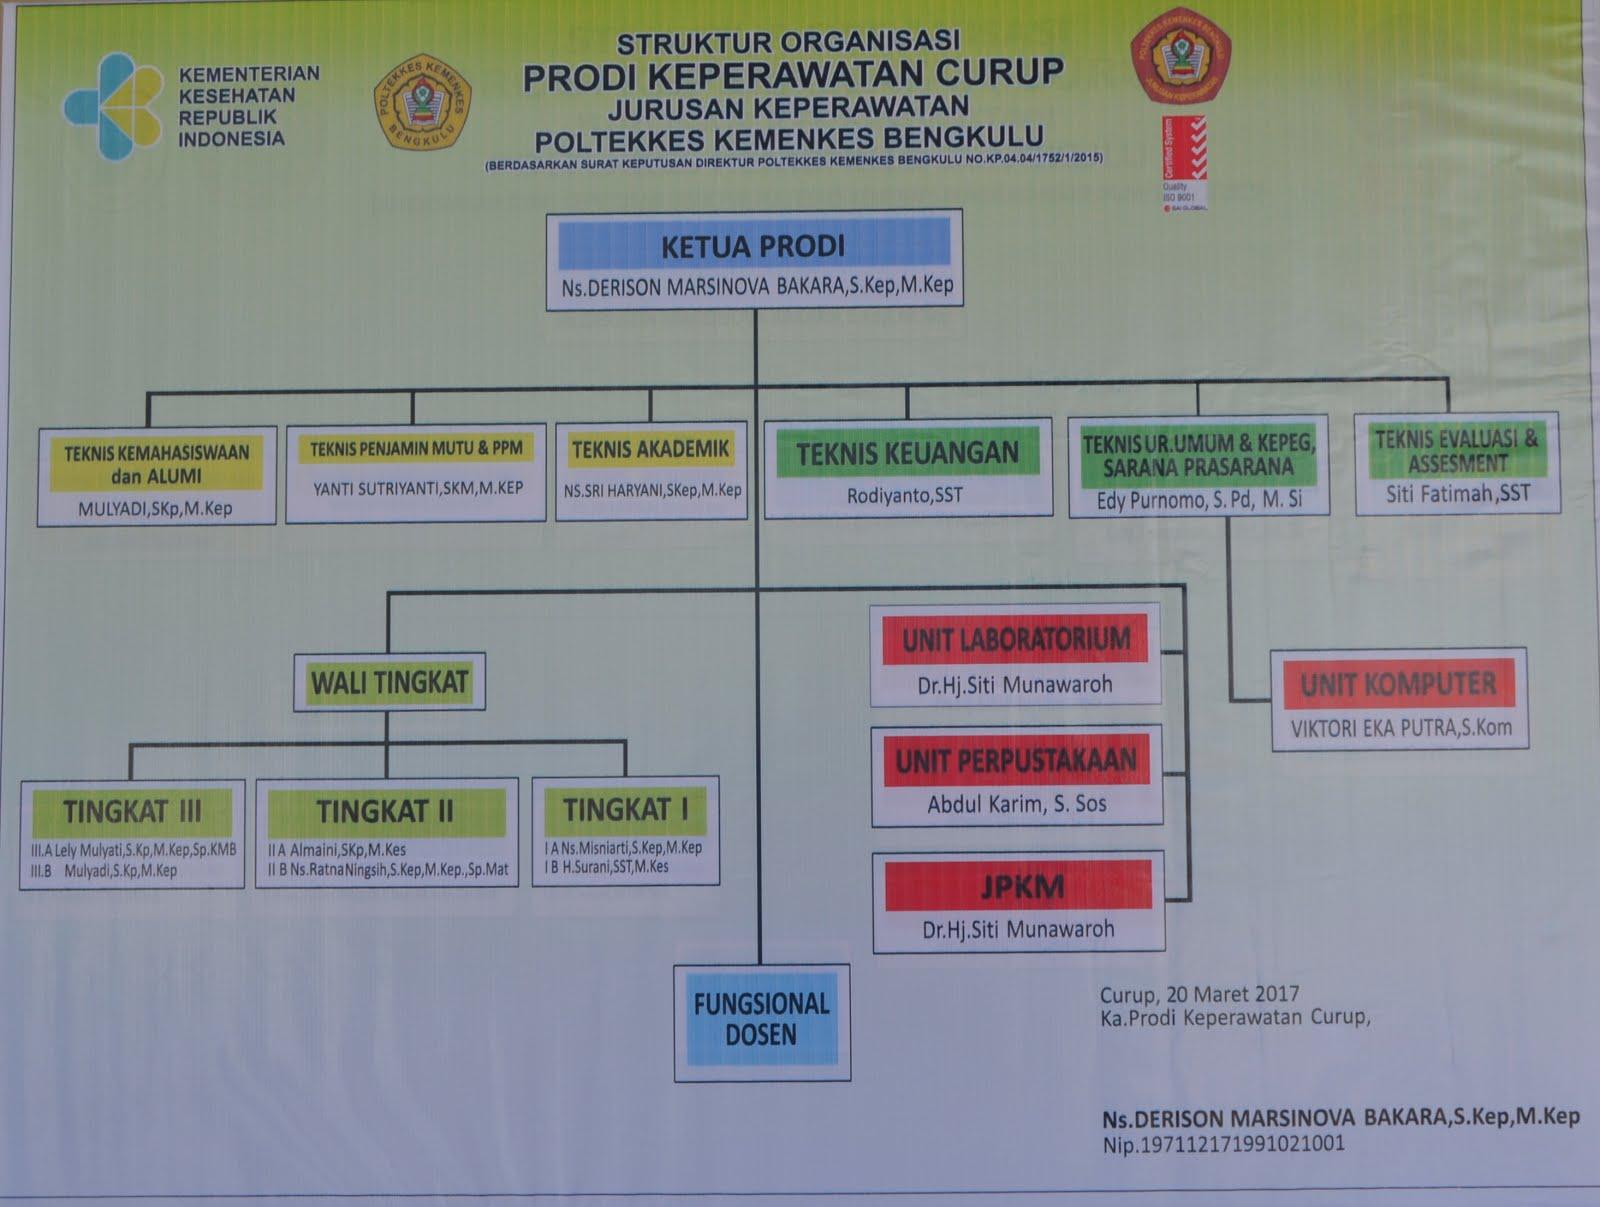 Struktur Organisasi DIII Keperawatan Curup